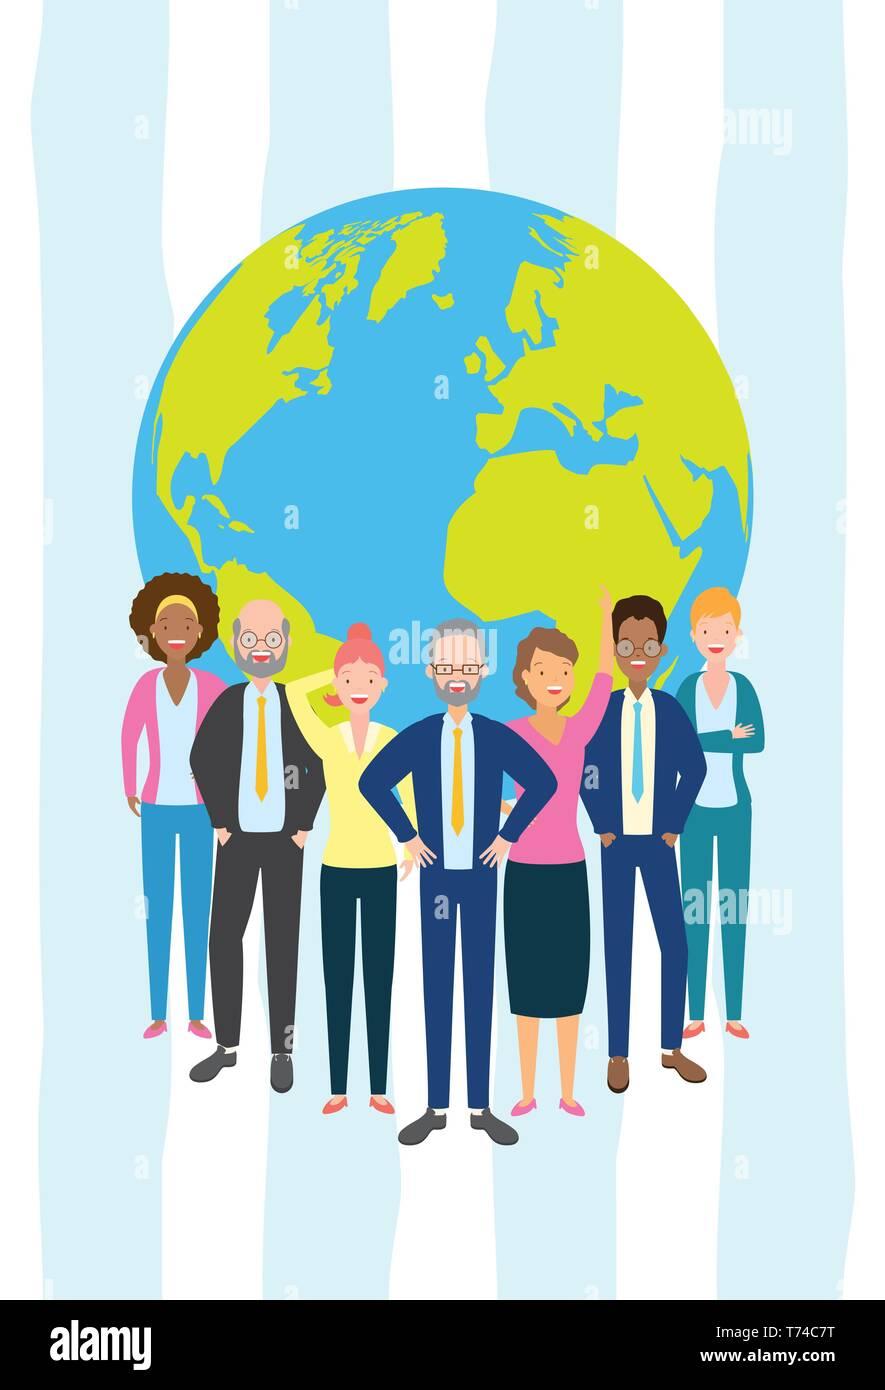 diversity man and woman - Stock Image